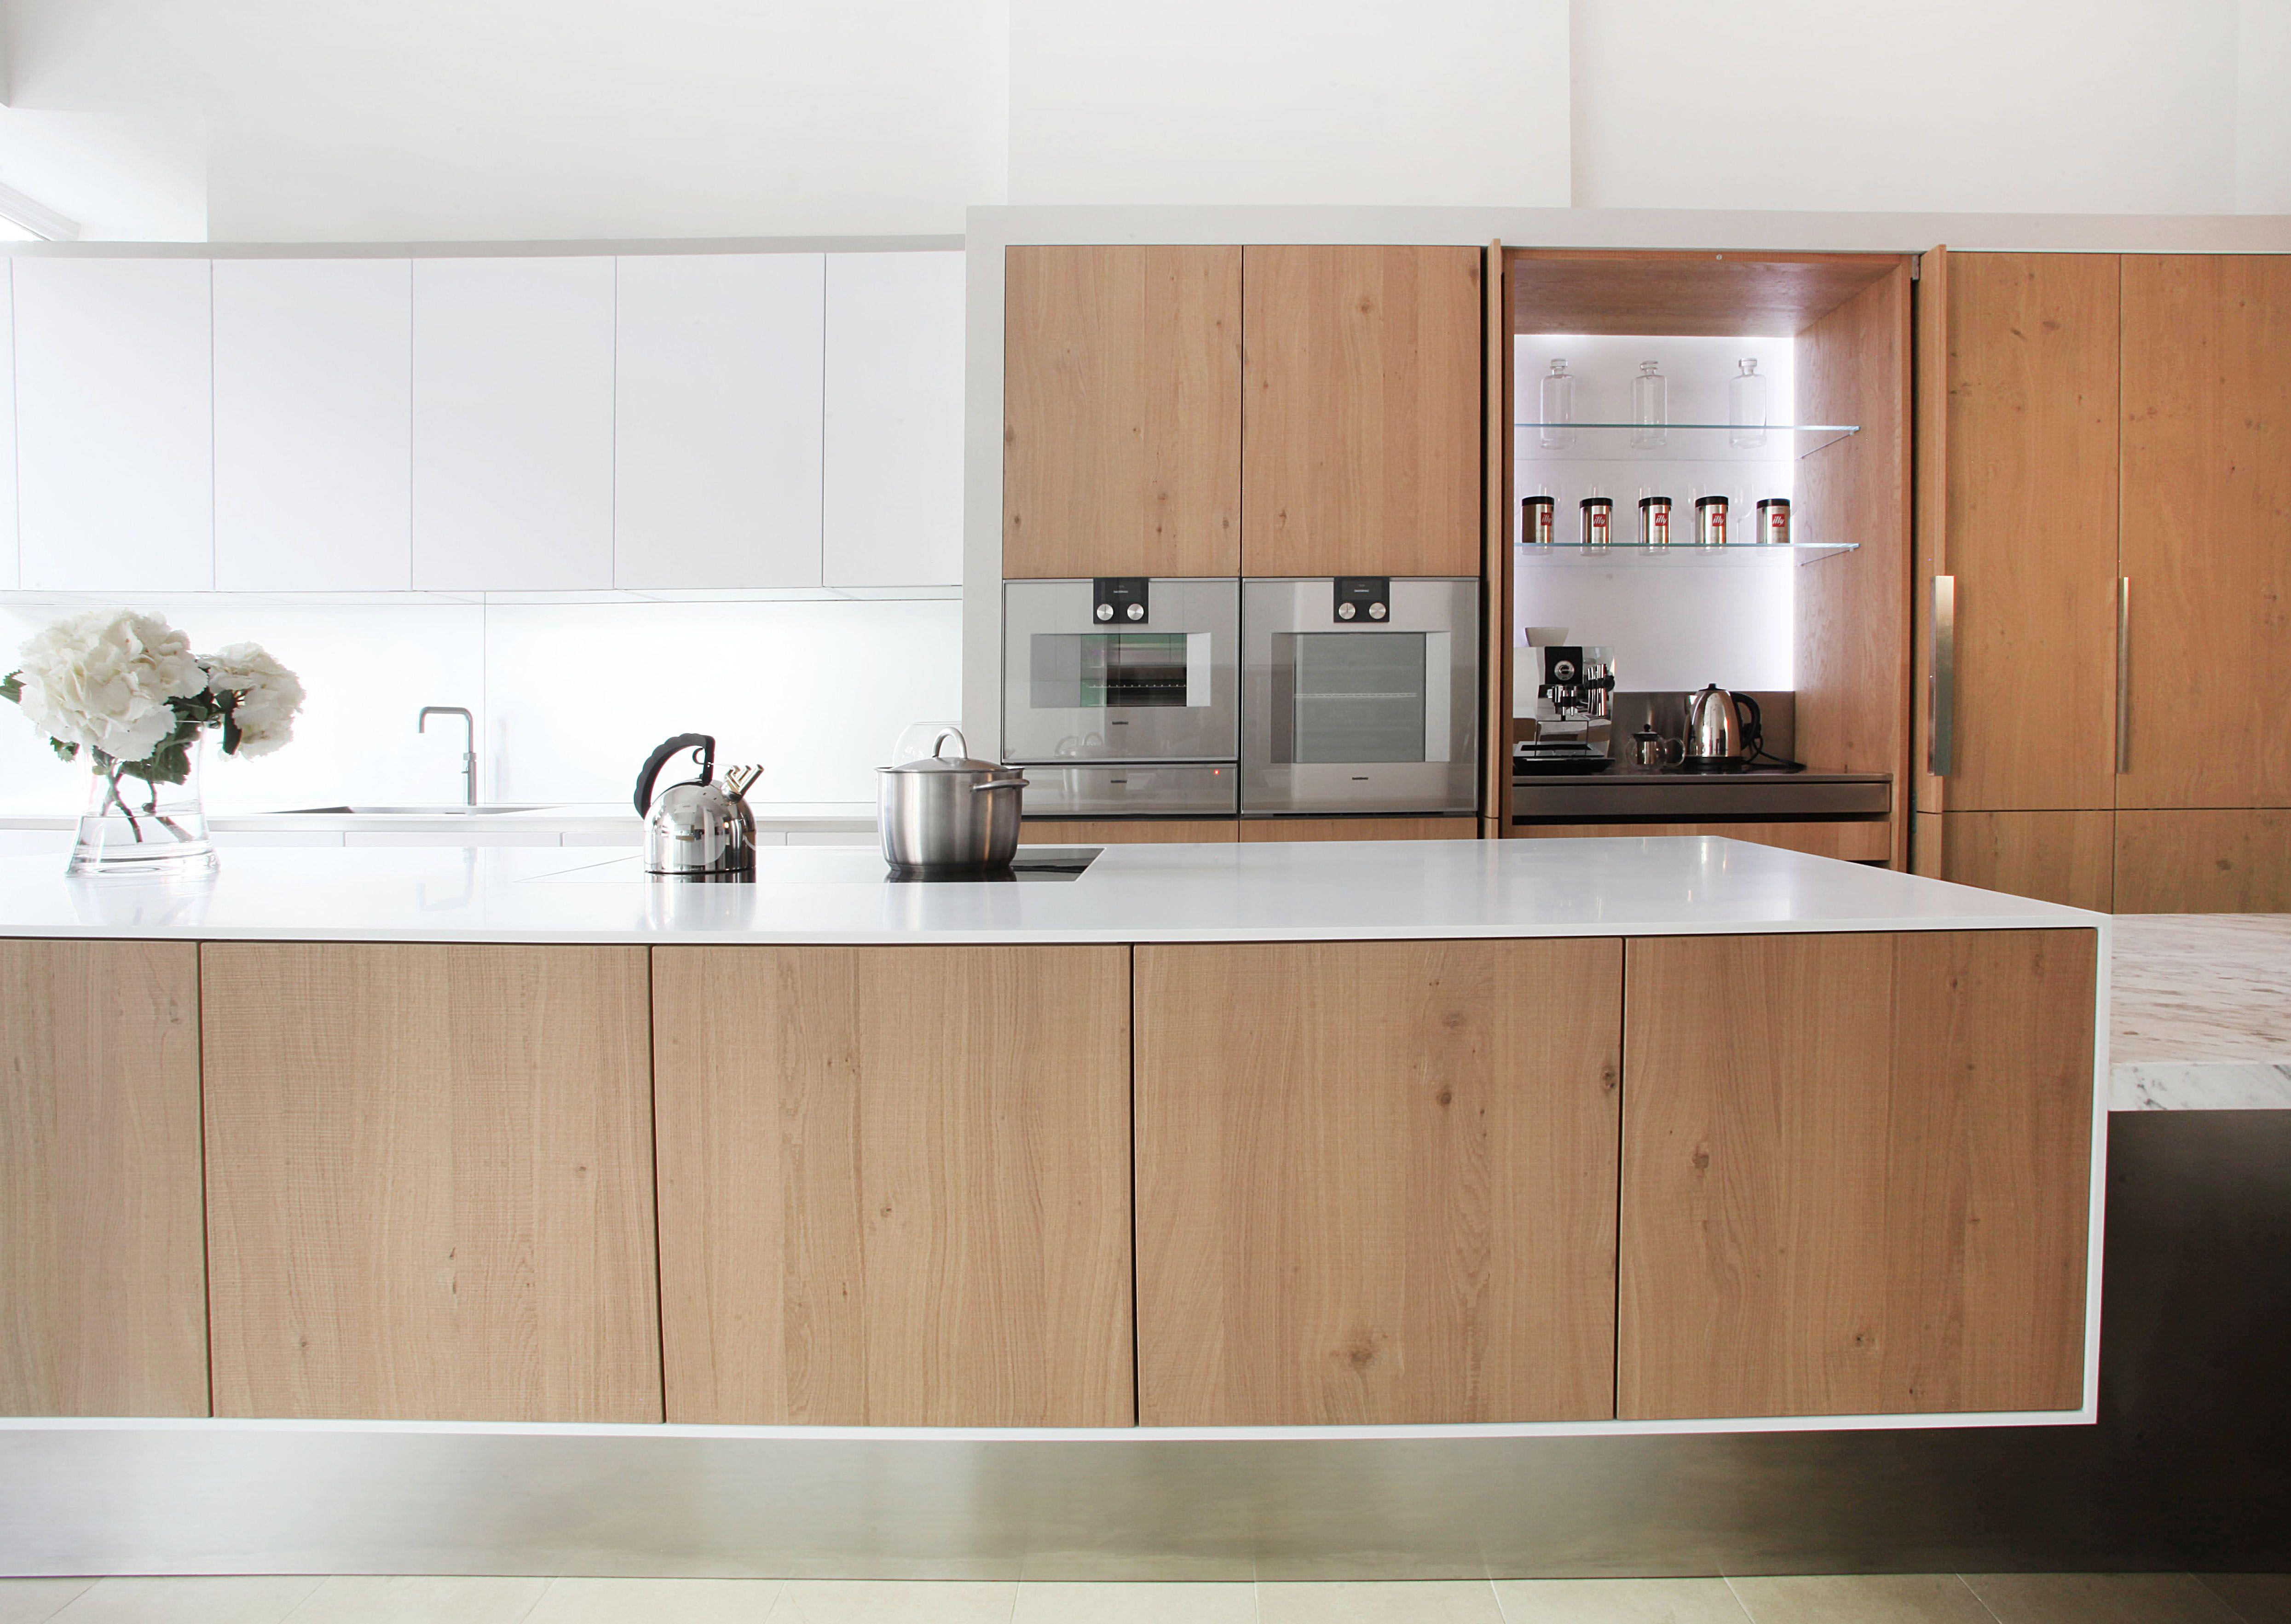 Corian Floating Island Matrix Showroom Www Matrixkitchens Co Uk  # Muebles New Style Villa Tesei